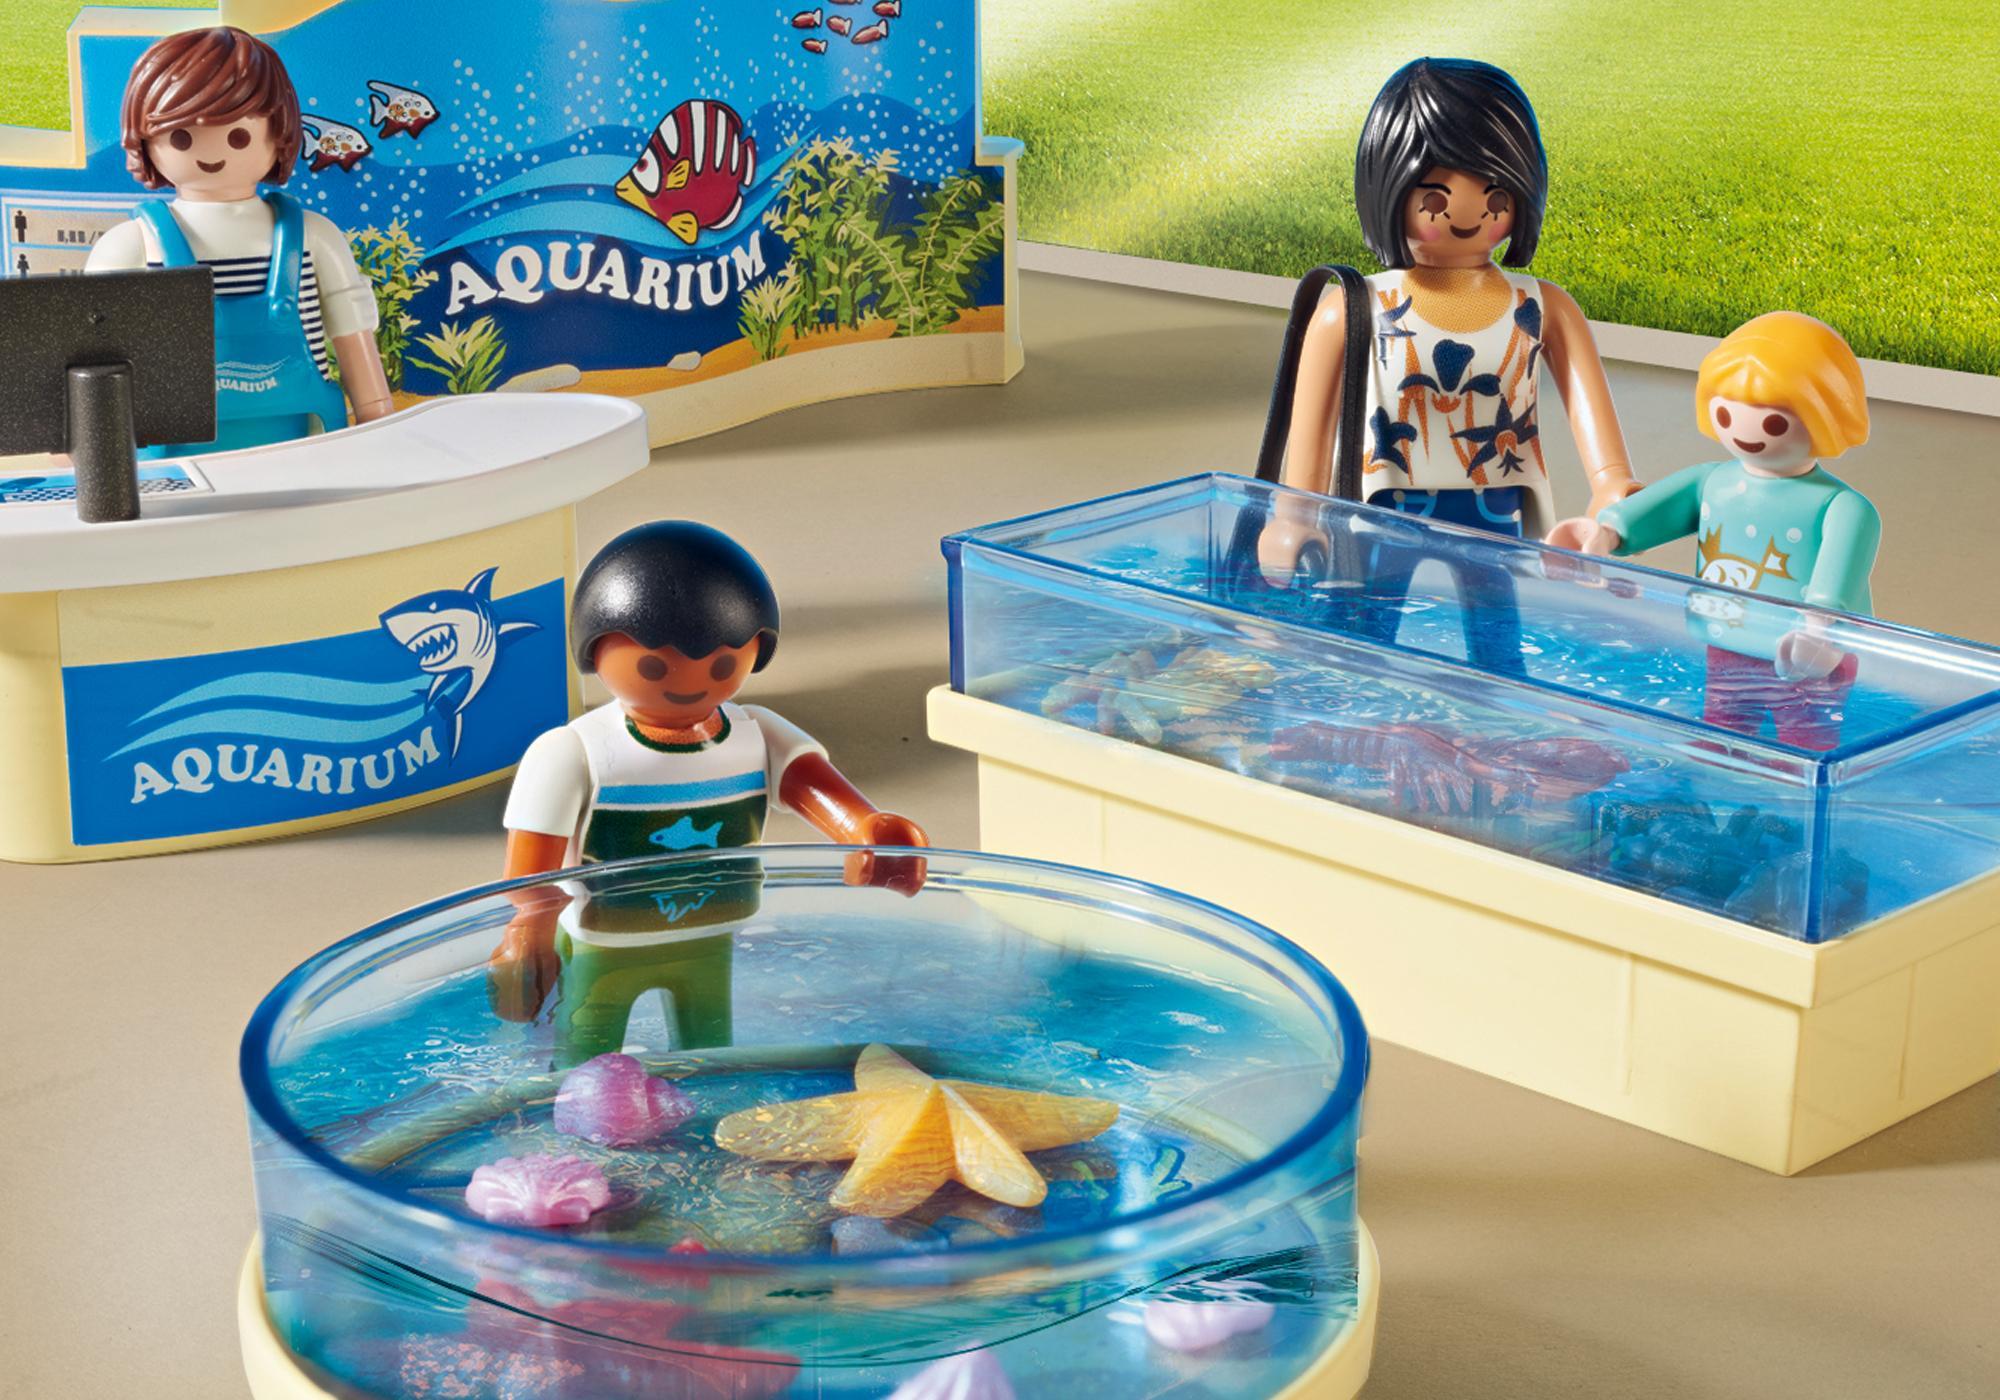 http://media.playmobil.com/i/playmobil/9061_product_extra2/Tienda del Acuario